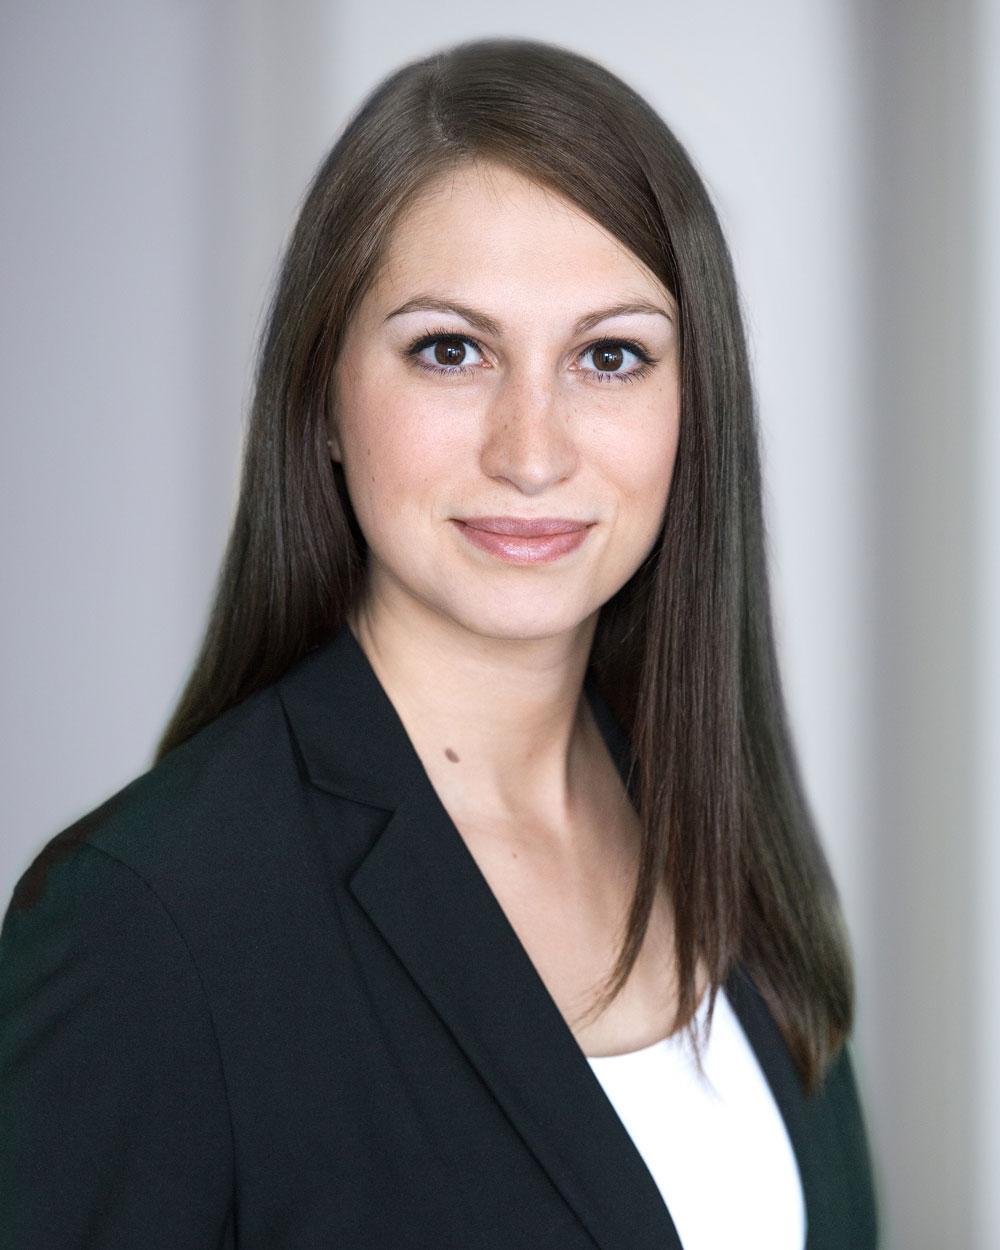 Elena Wenz